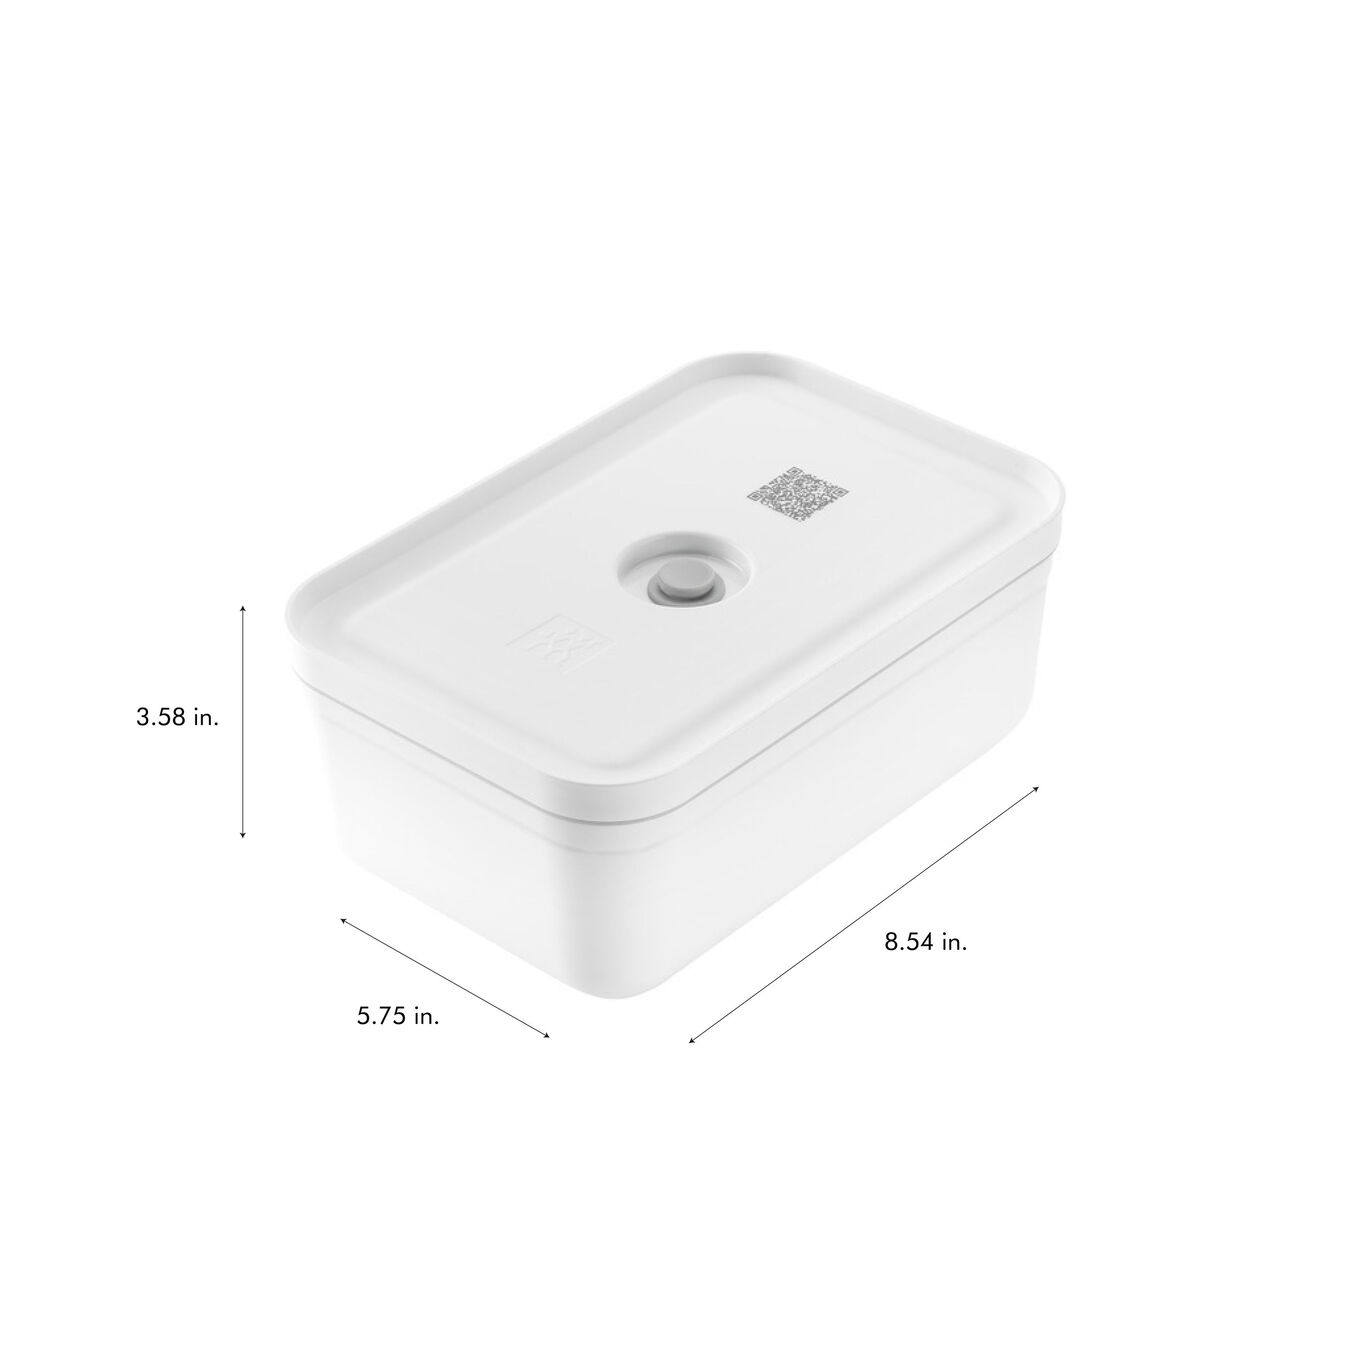 Vakuum Lunchbox, L, Kunststoff, Weiß,,large 9